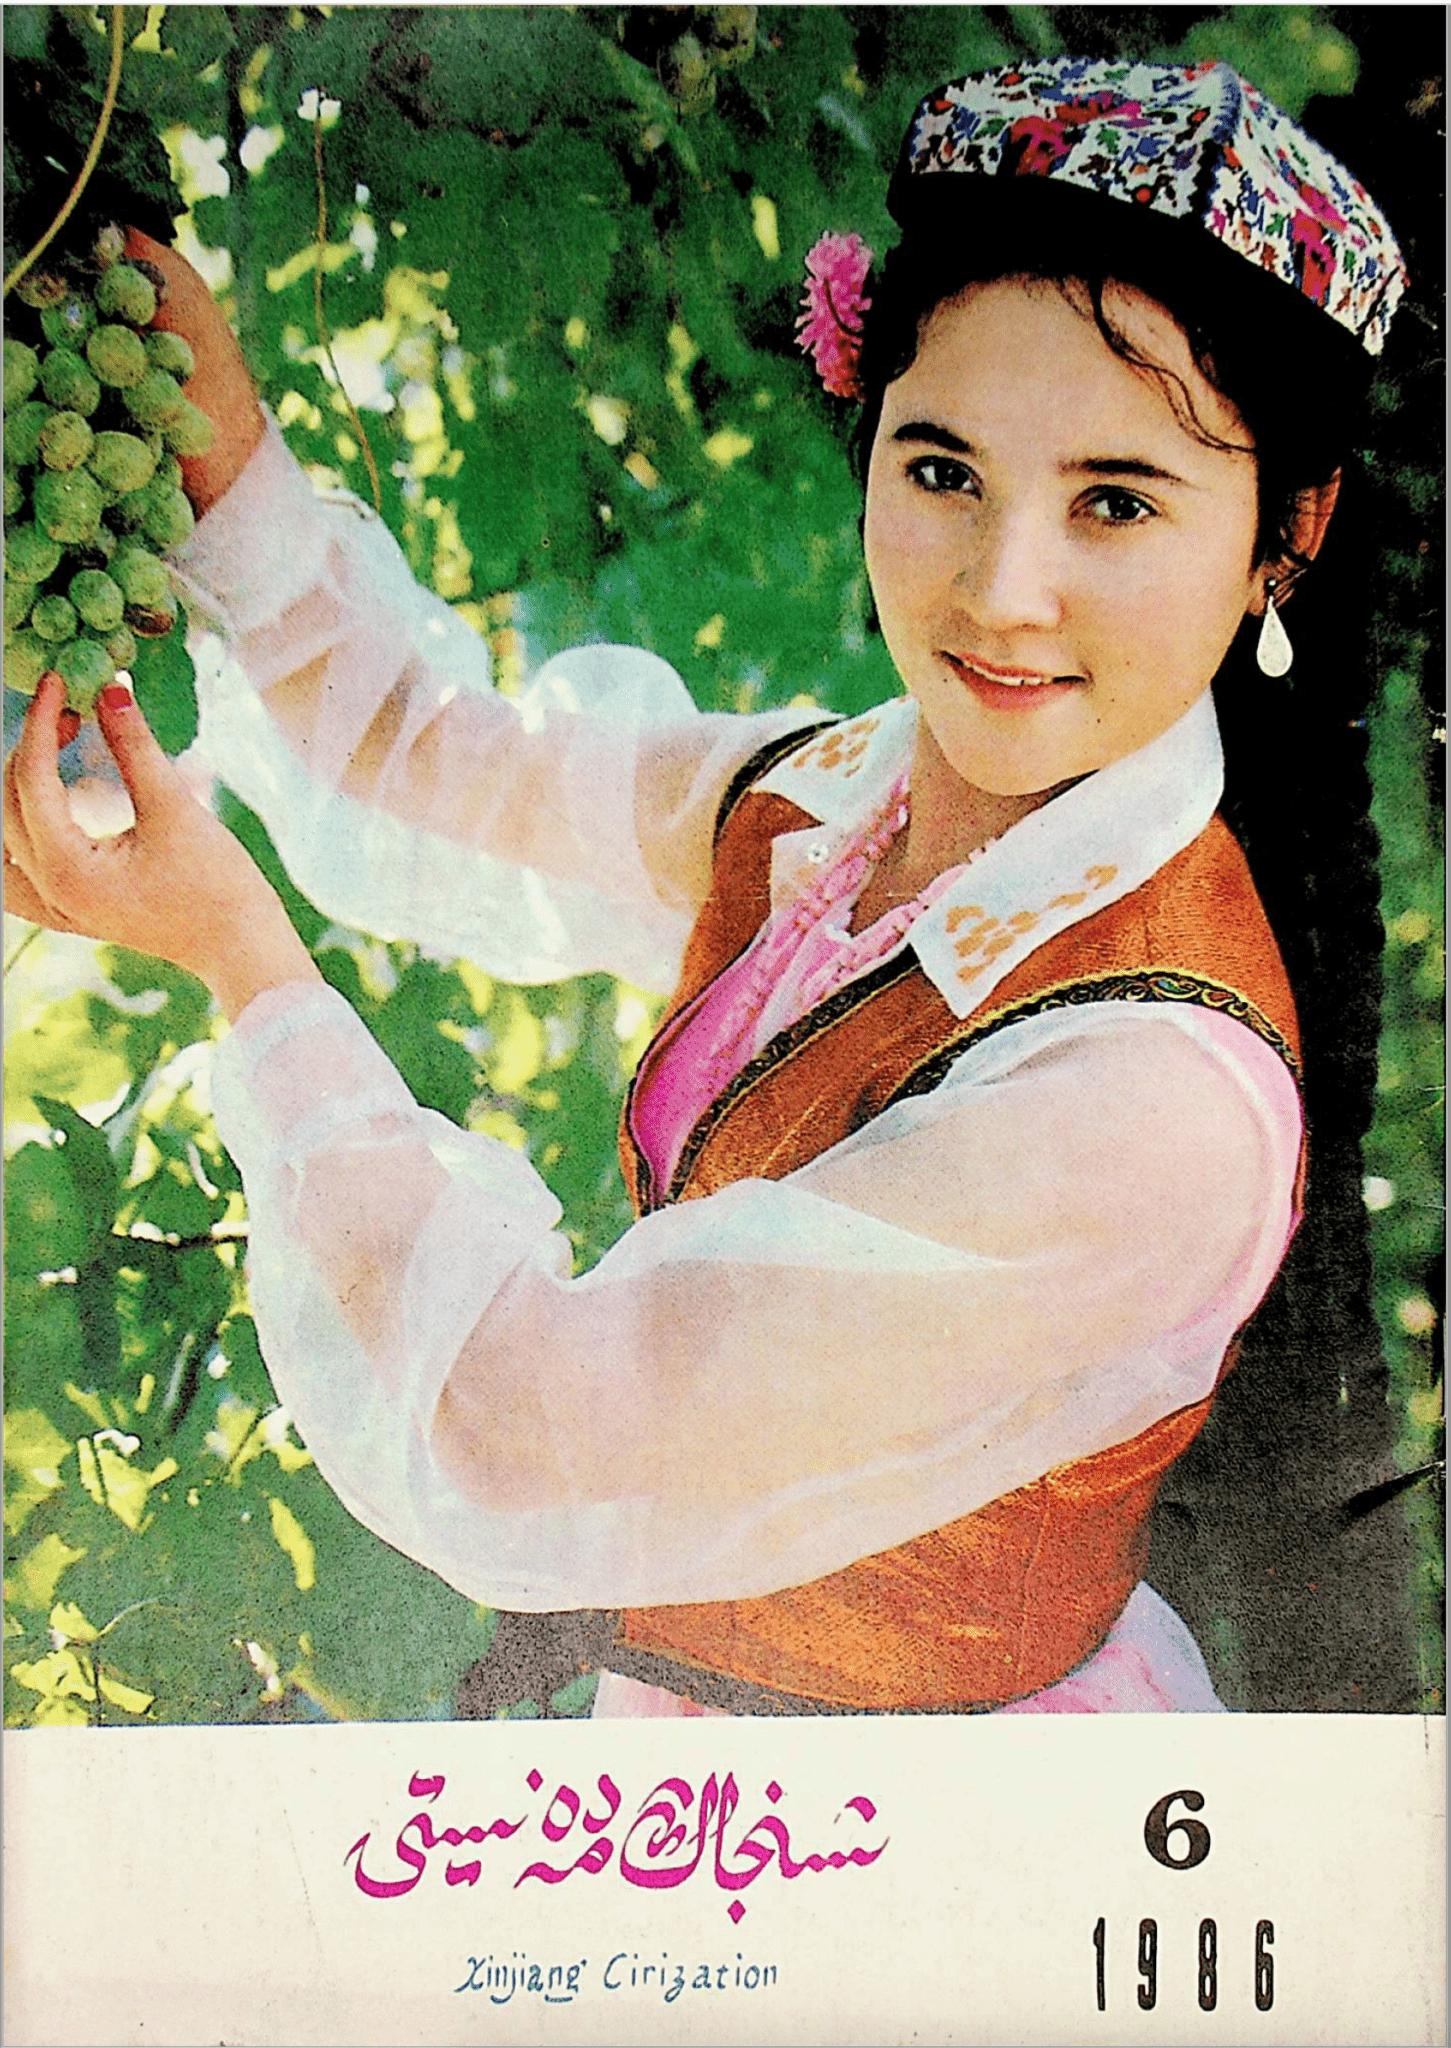 Screenshot 2020 03 10 at 16.13.09 - شىنجاڭ مەدەنىيىتى 1986-يىلى 6-سان